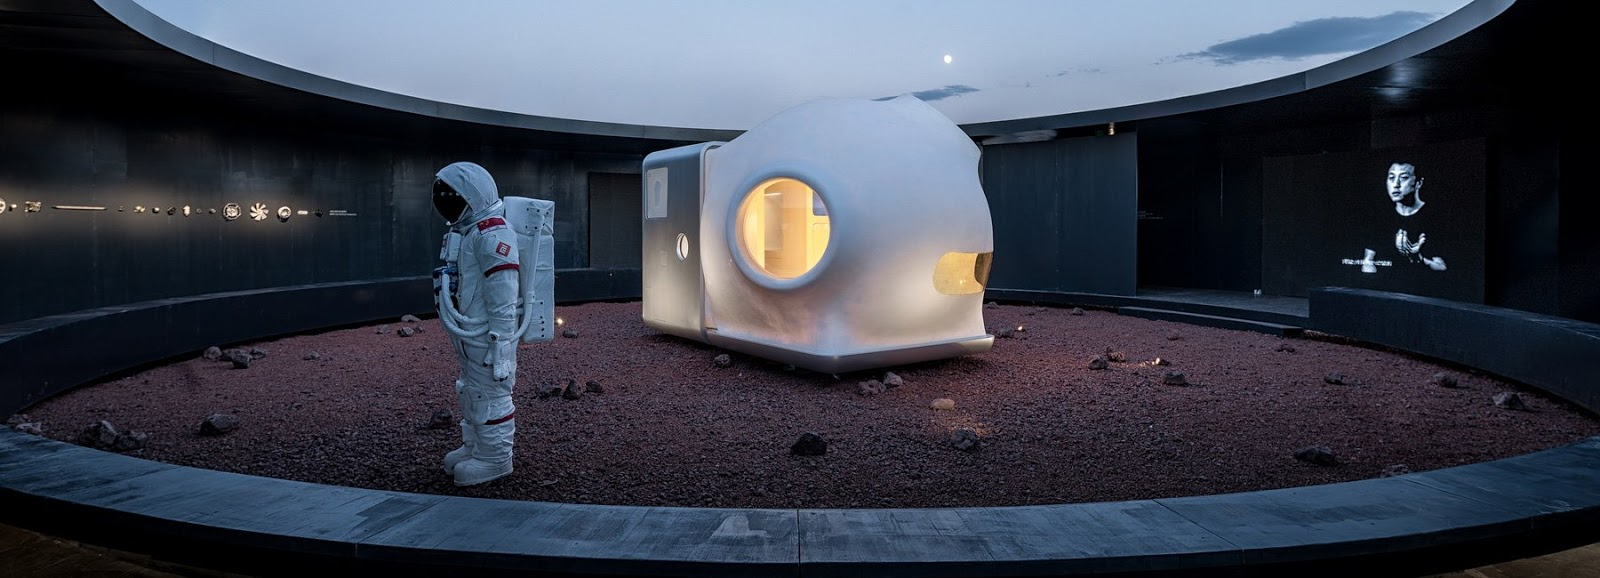 xiaomi mars living cabin